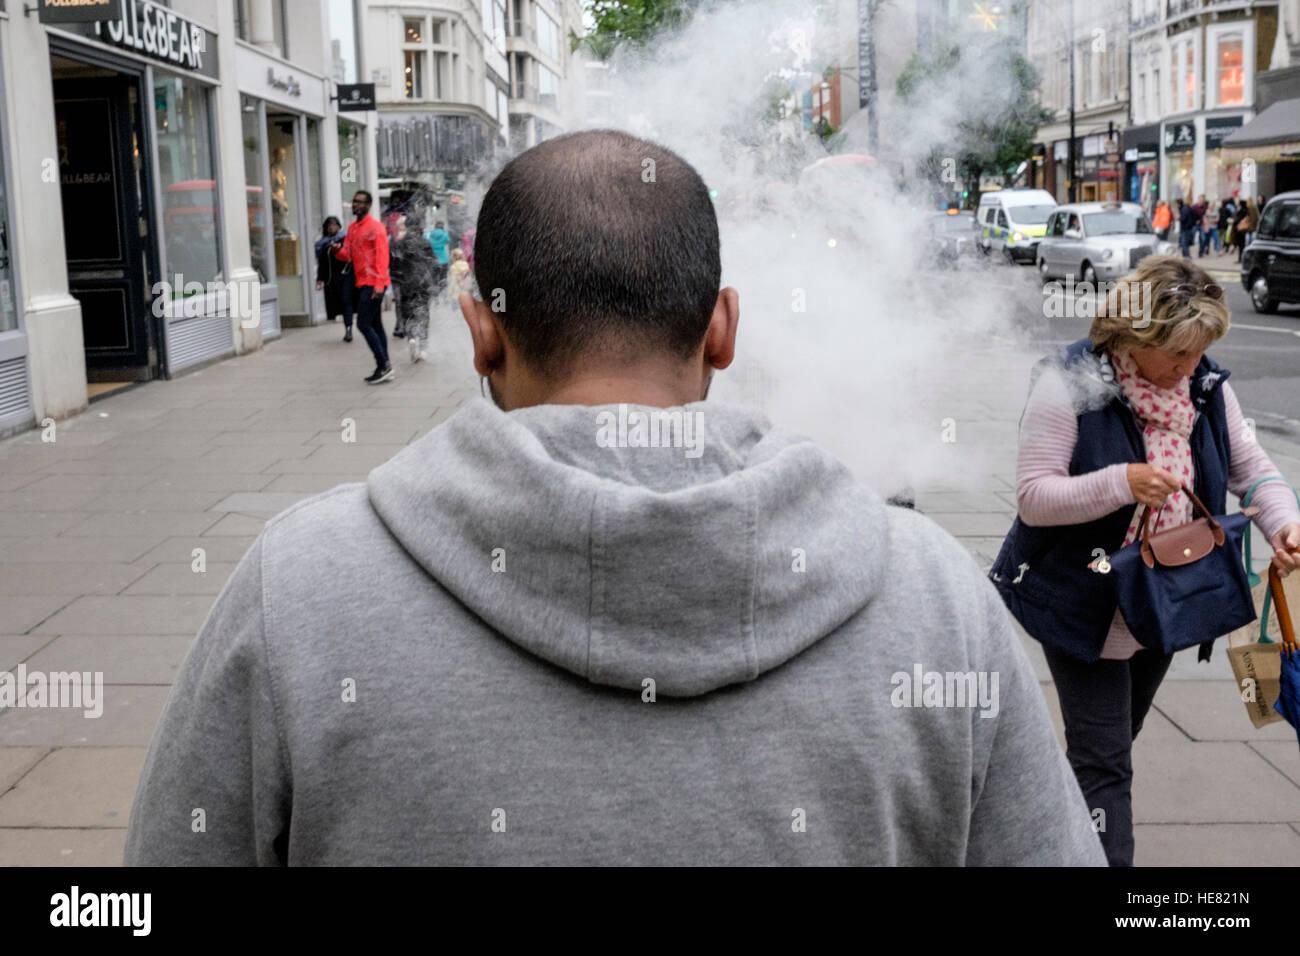 Man exhales e-cigarette smoke causing passer by to take evasive action. - Stock Image